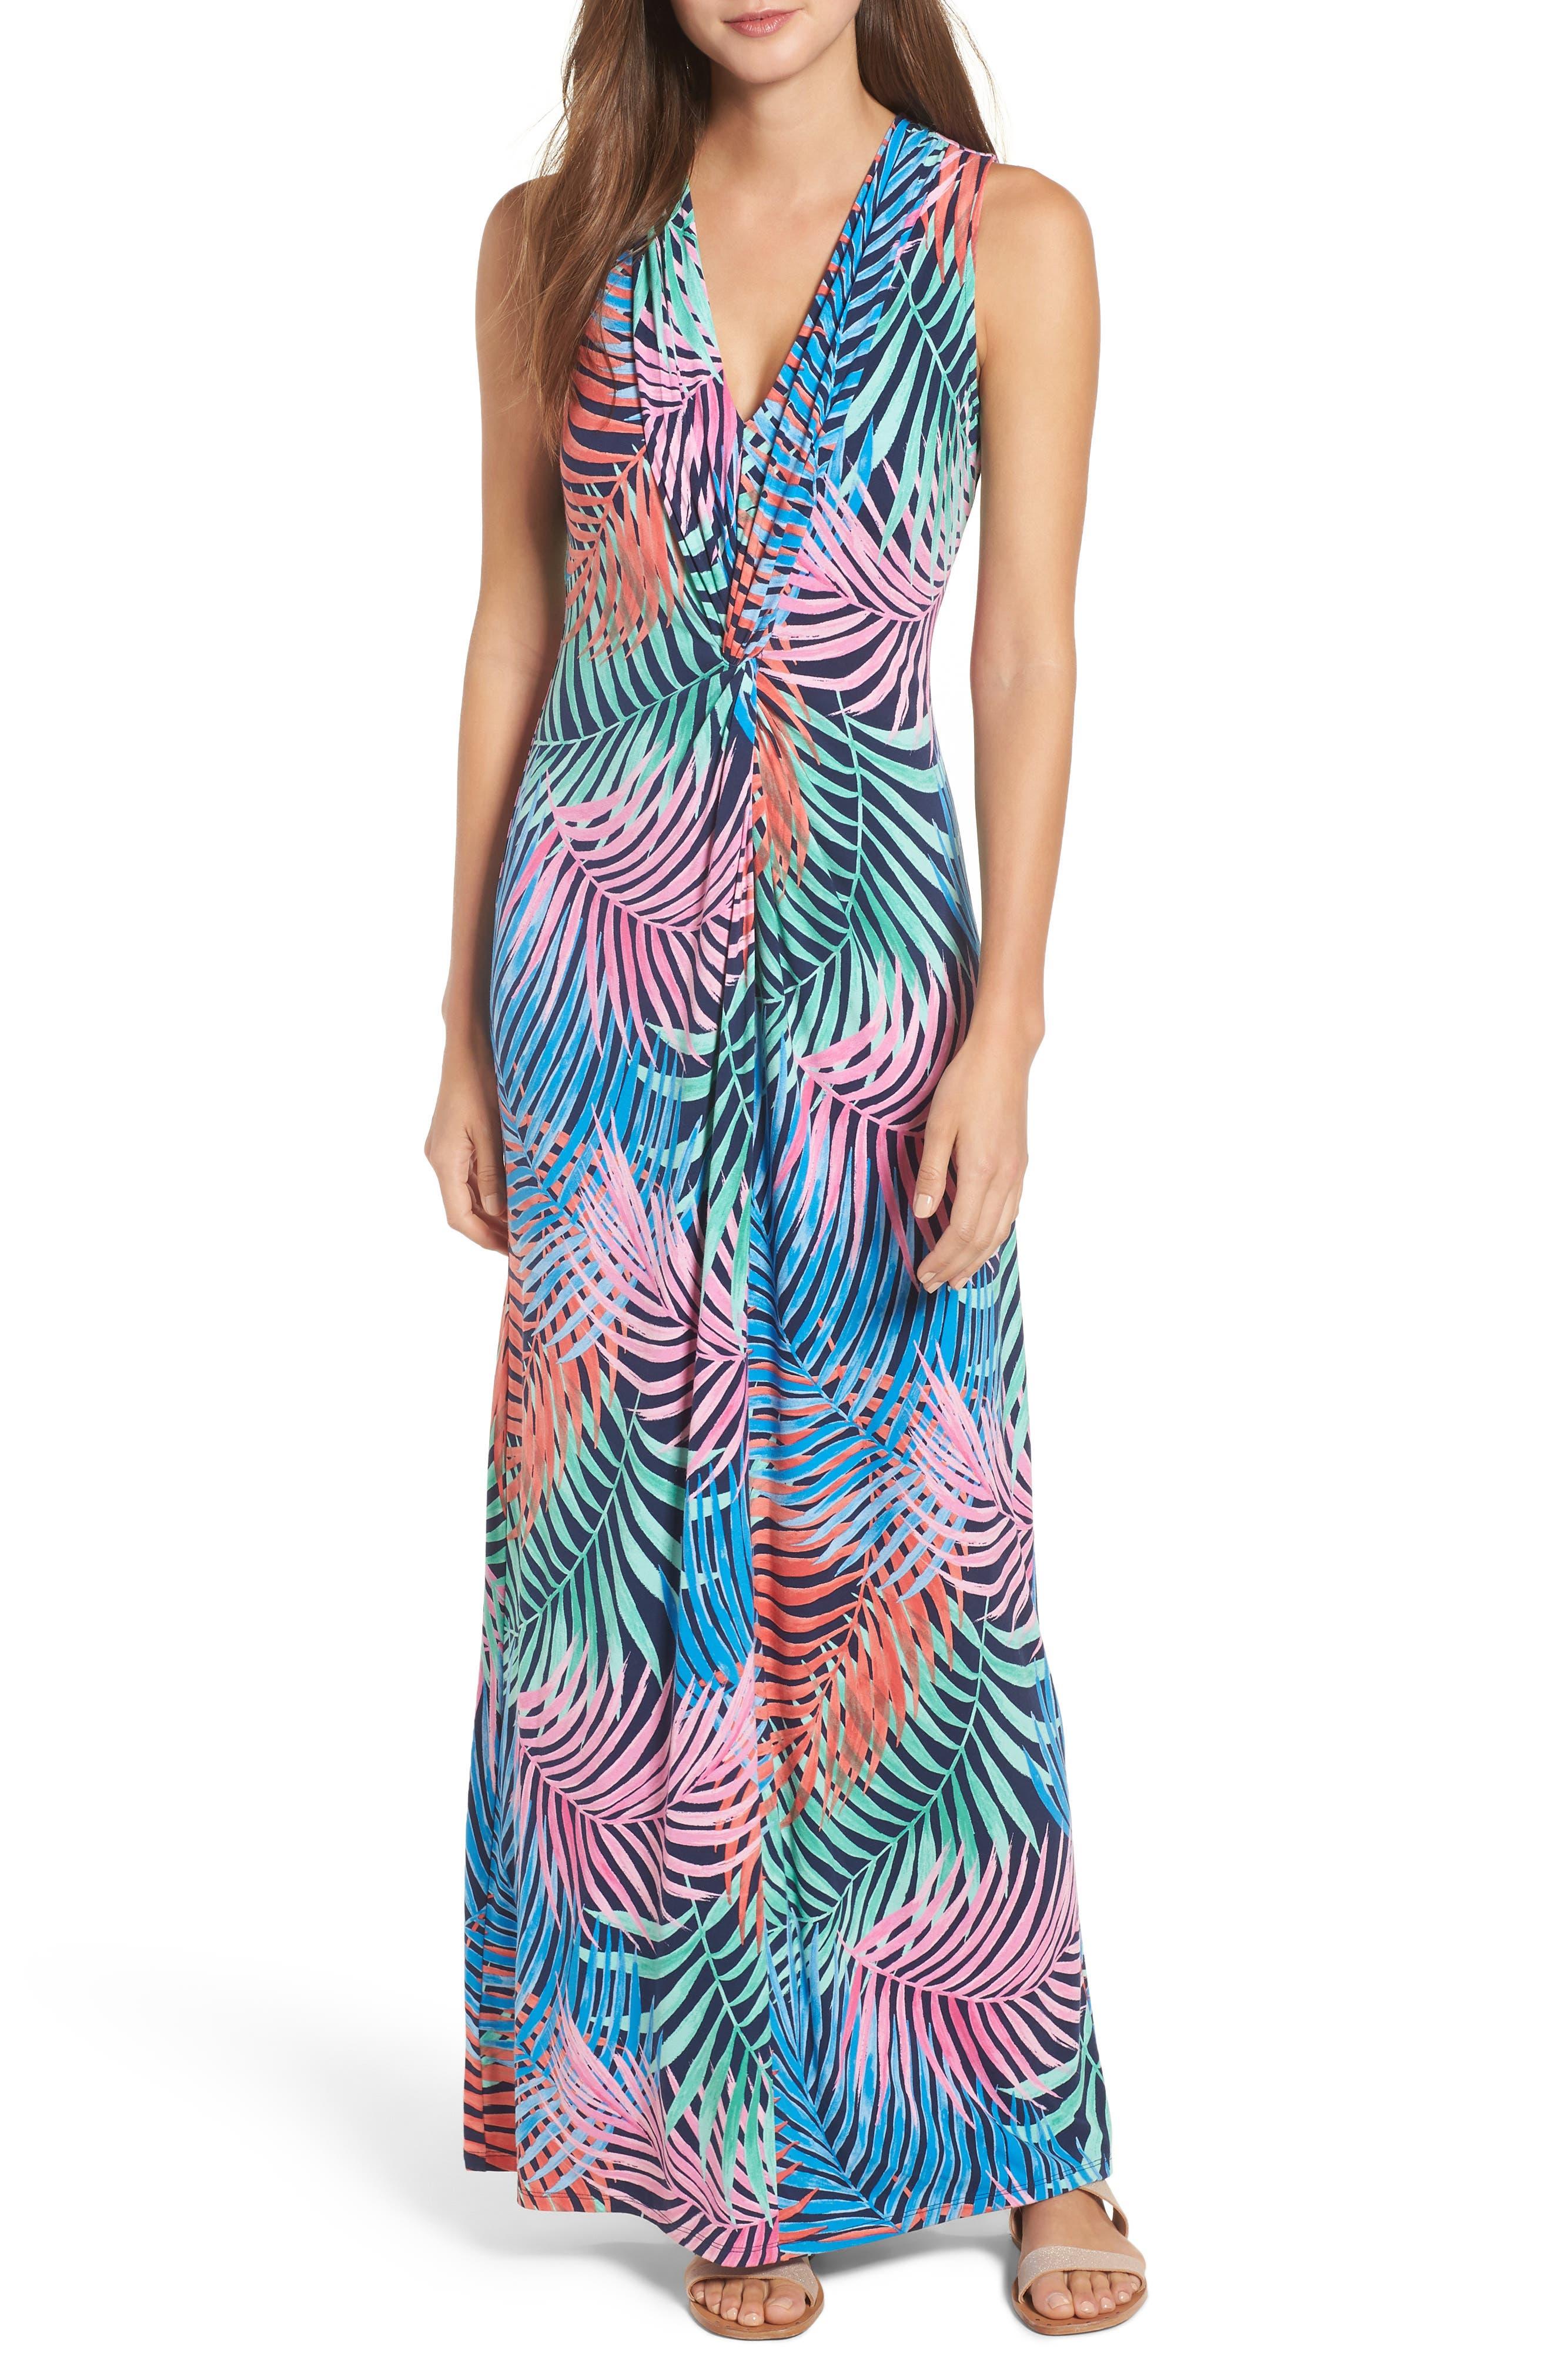 Tulum Trance Twist Maxi Dress,                         Main,                         color, OCEAN DEEP